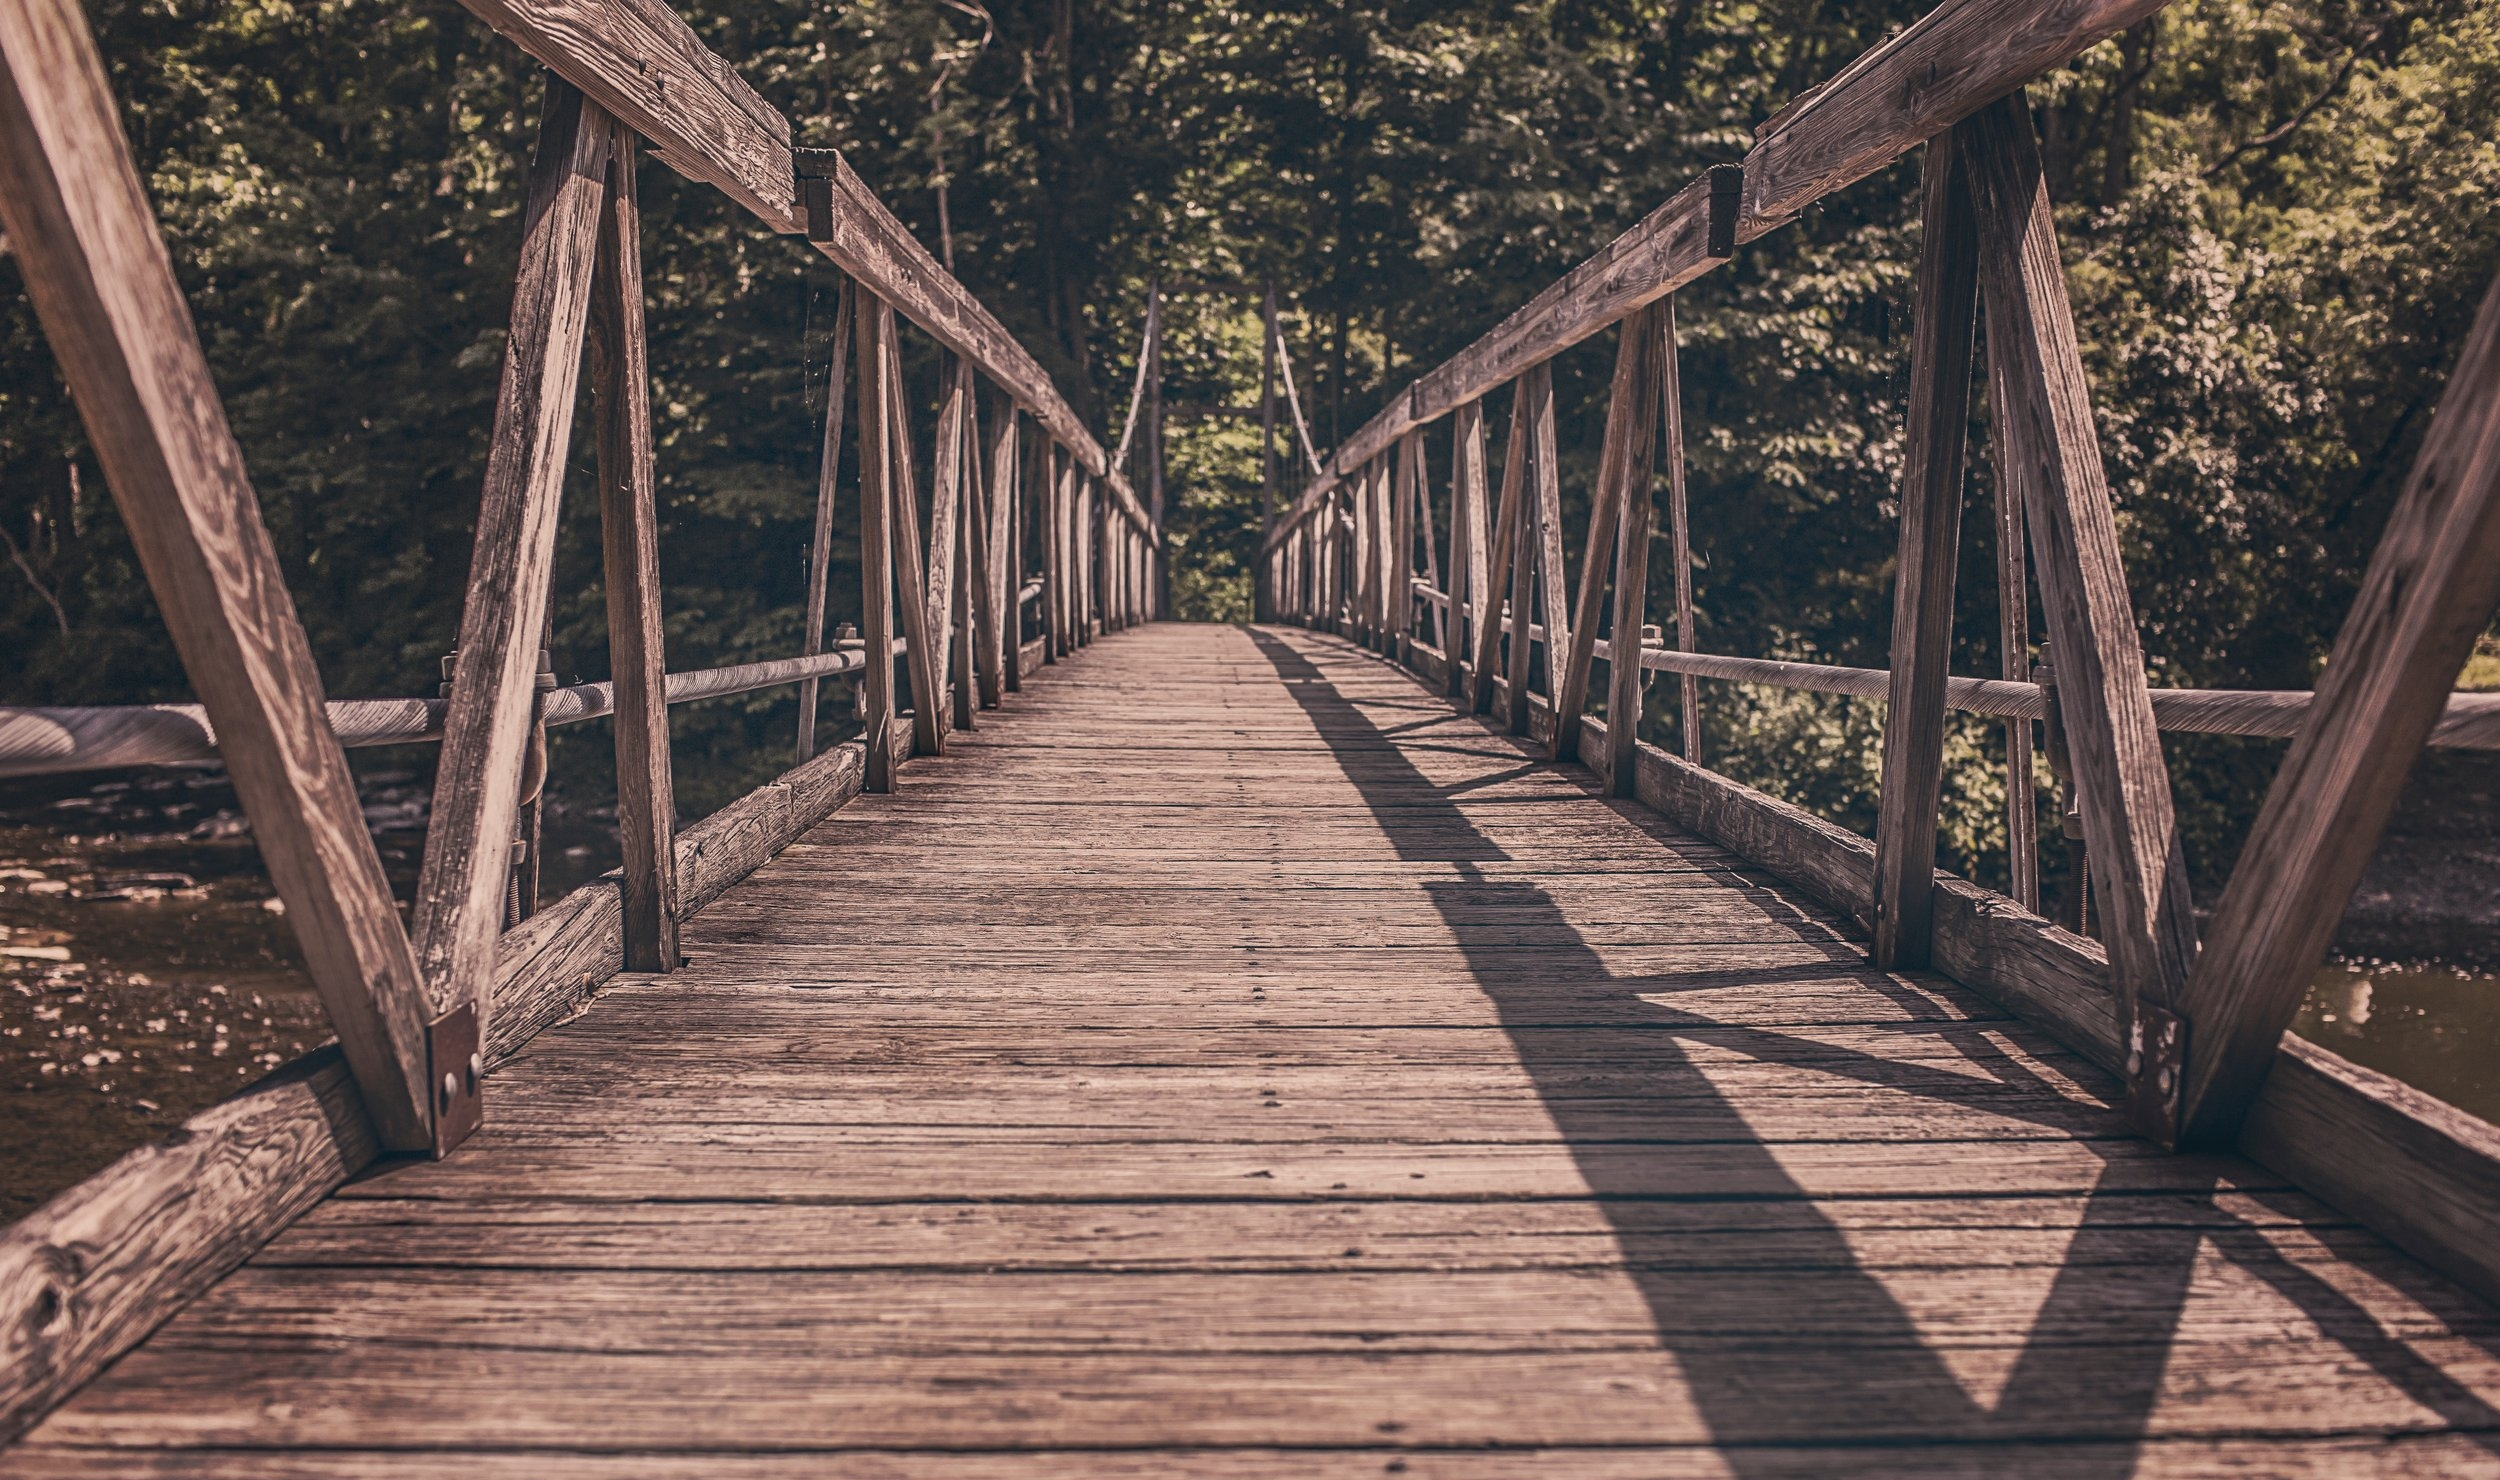 bridge-footbridge-path-2257.jpg